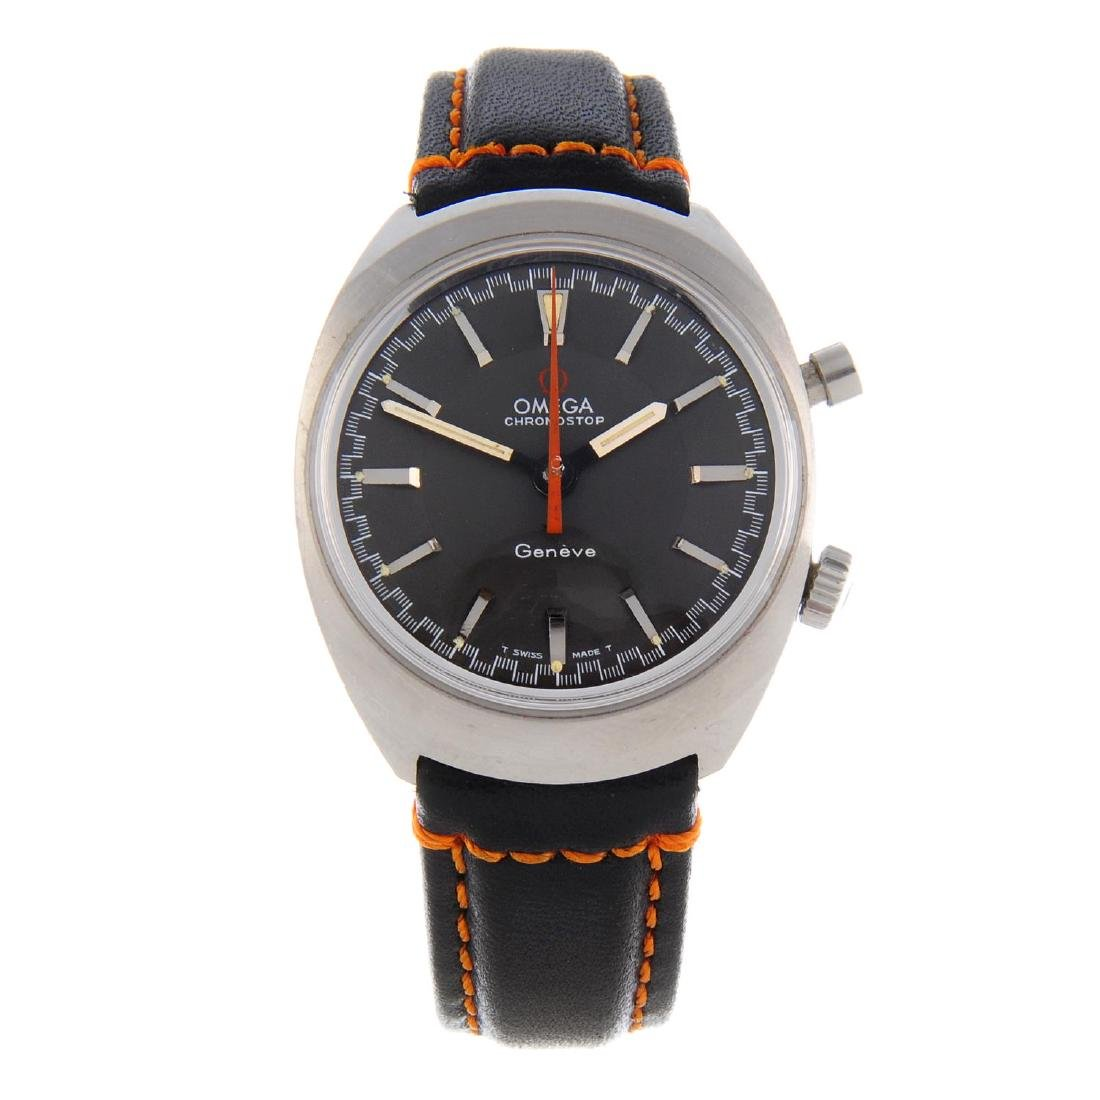 OMEGA - a gentleman's Chronostop wrist watch. Stainless